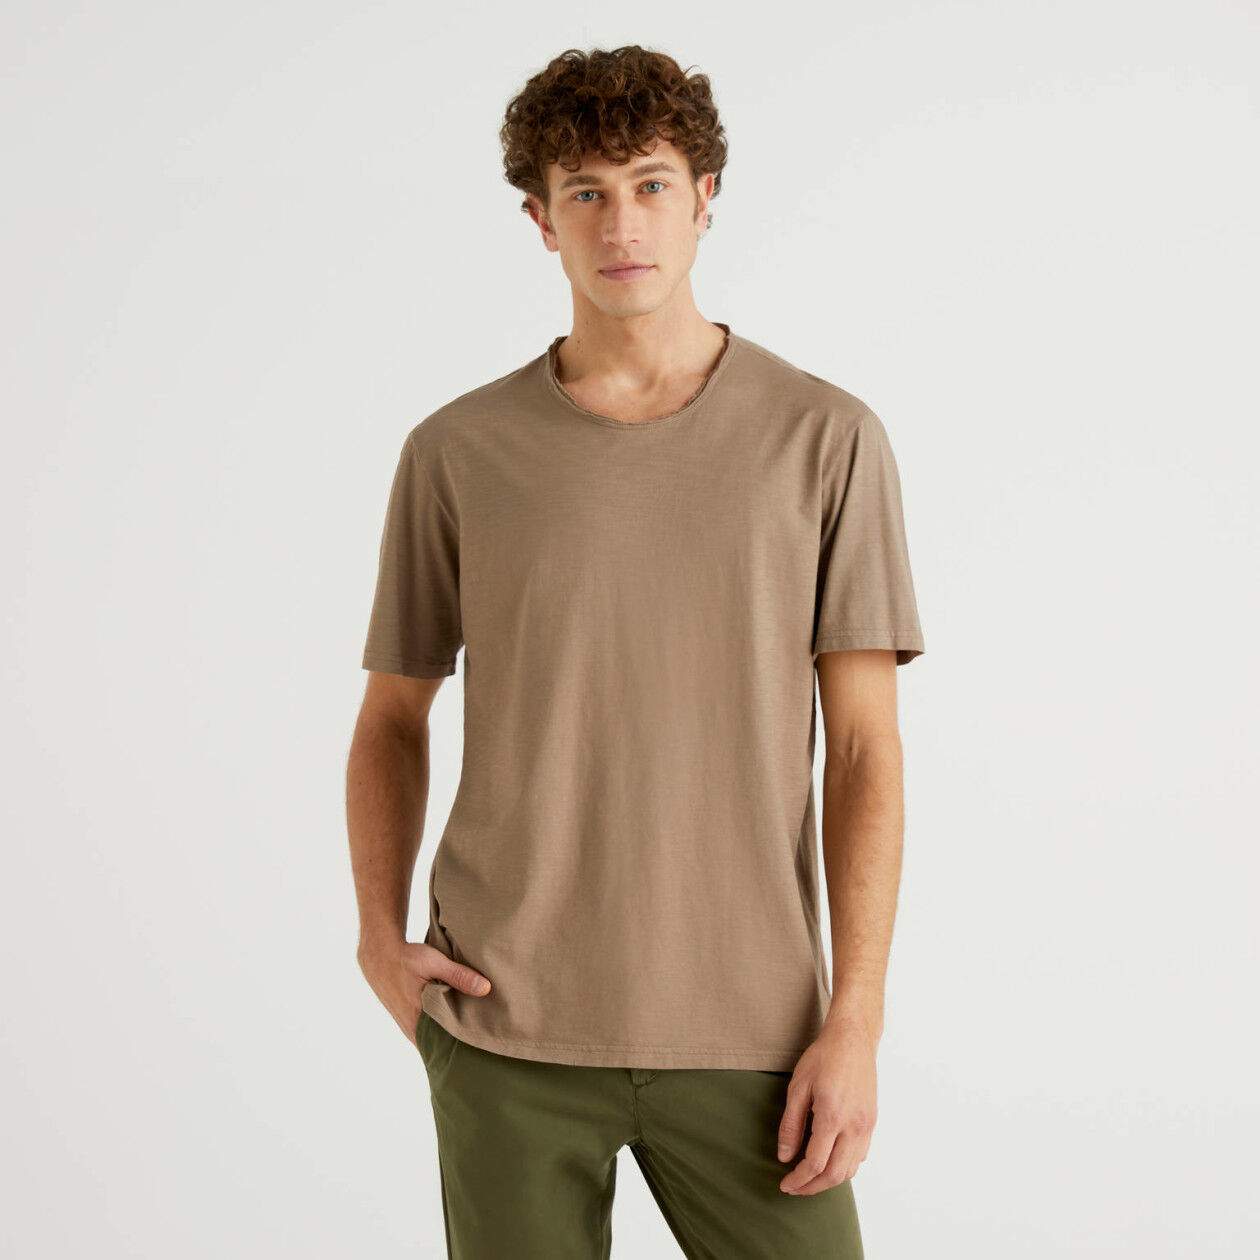 Dove gray t-shirt in pure cotton